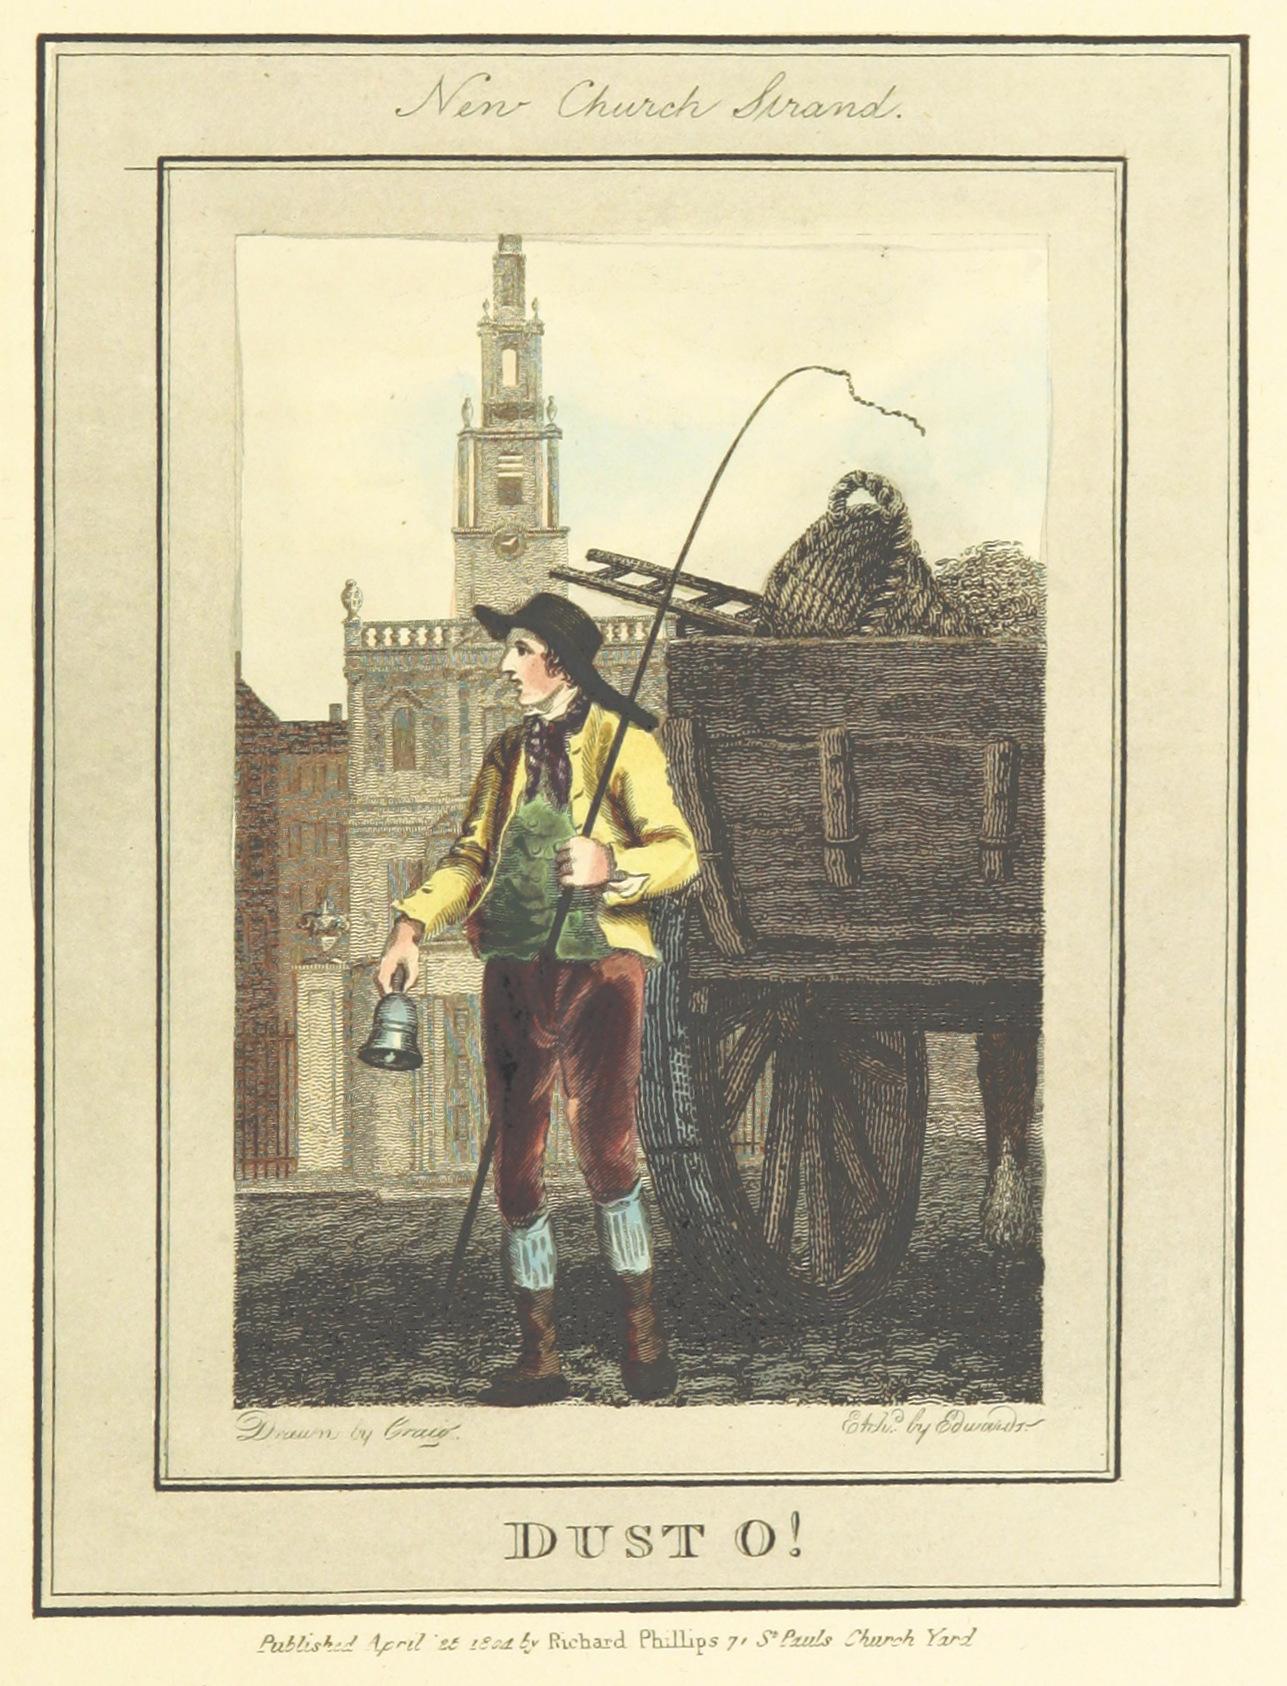 Phillips(1804)_p593_-_New_Church_Strand_-_Dust_O!